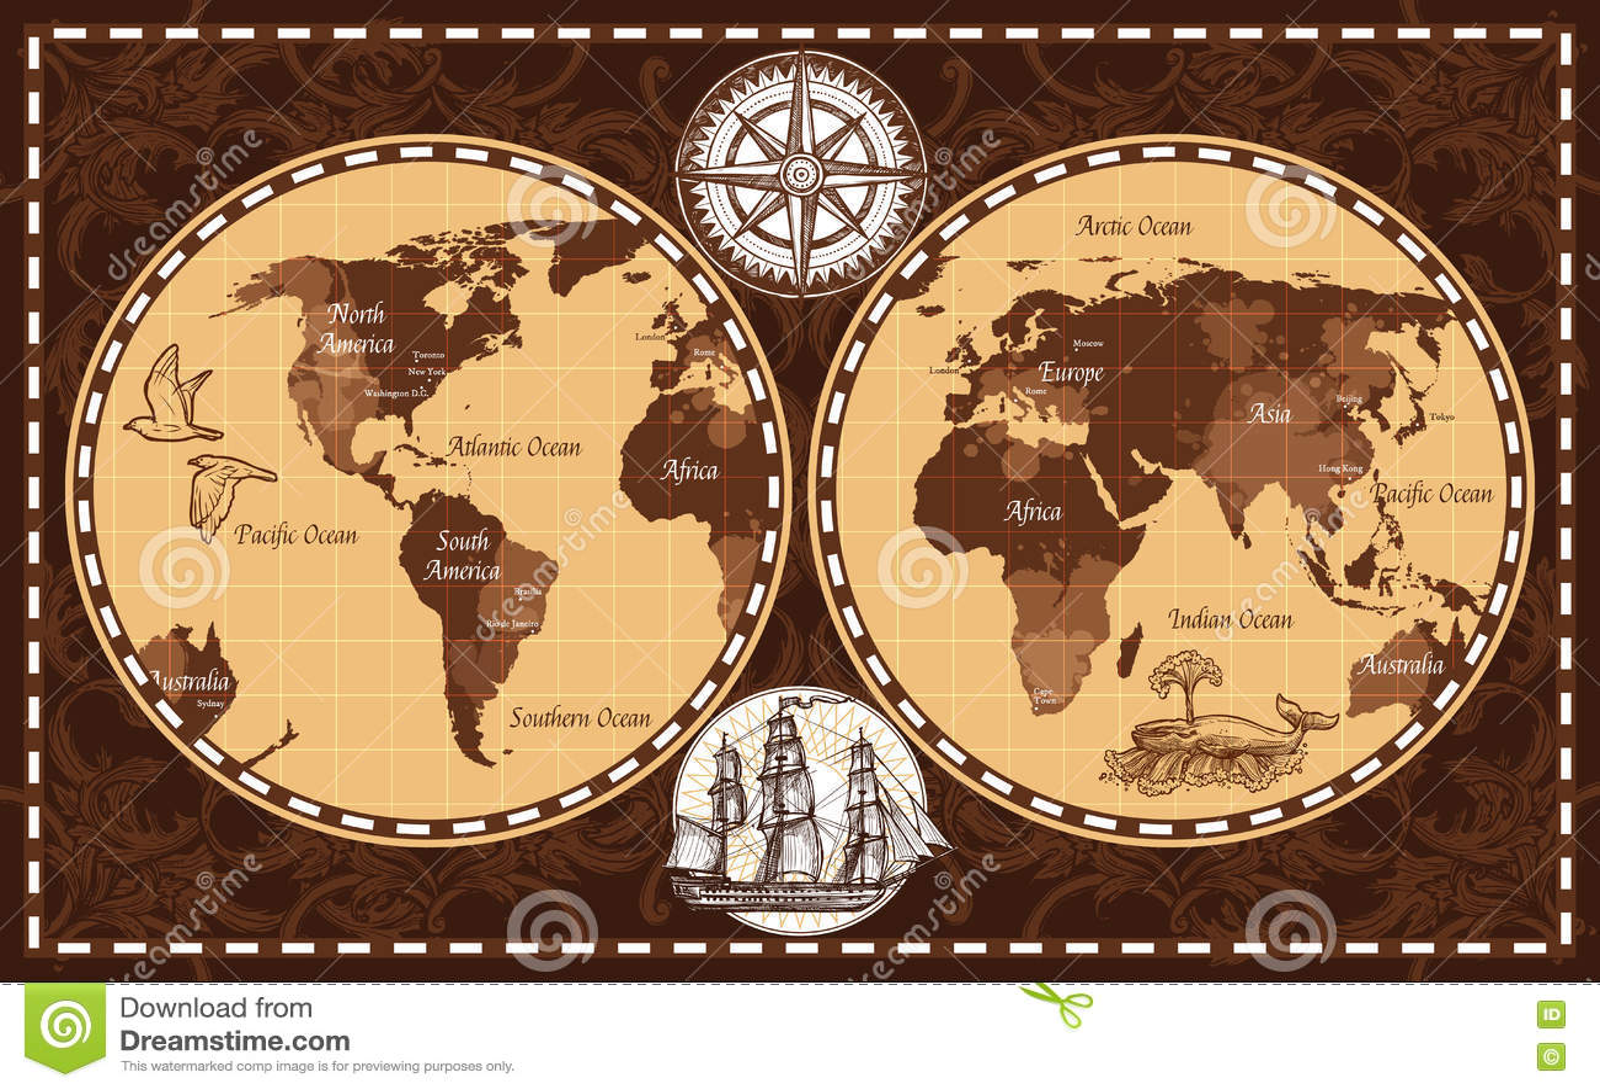 Retro world map stock vector illustration of route poster 78998035 download retro world map stock vector illustration of route poster 78998035 gumiabroncs Images